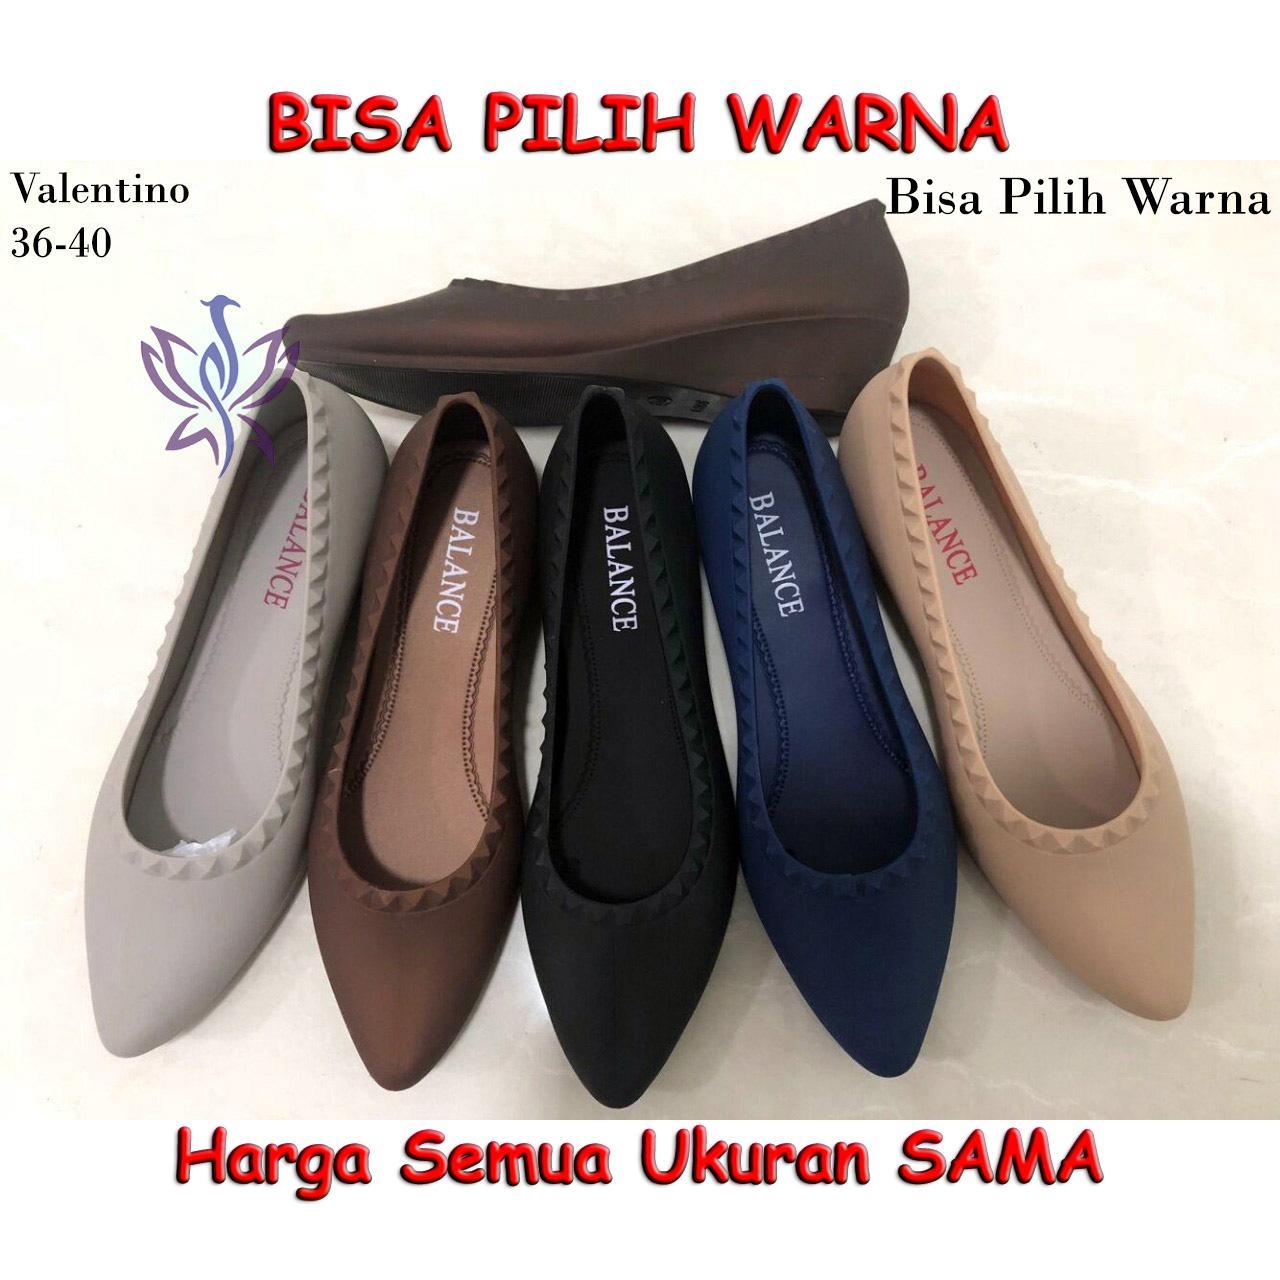 Sepatu Wedges Jelly Shoes Wanita Import Quality Bisa Pilih Warna JLWGPAKU 52847b6c4c